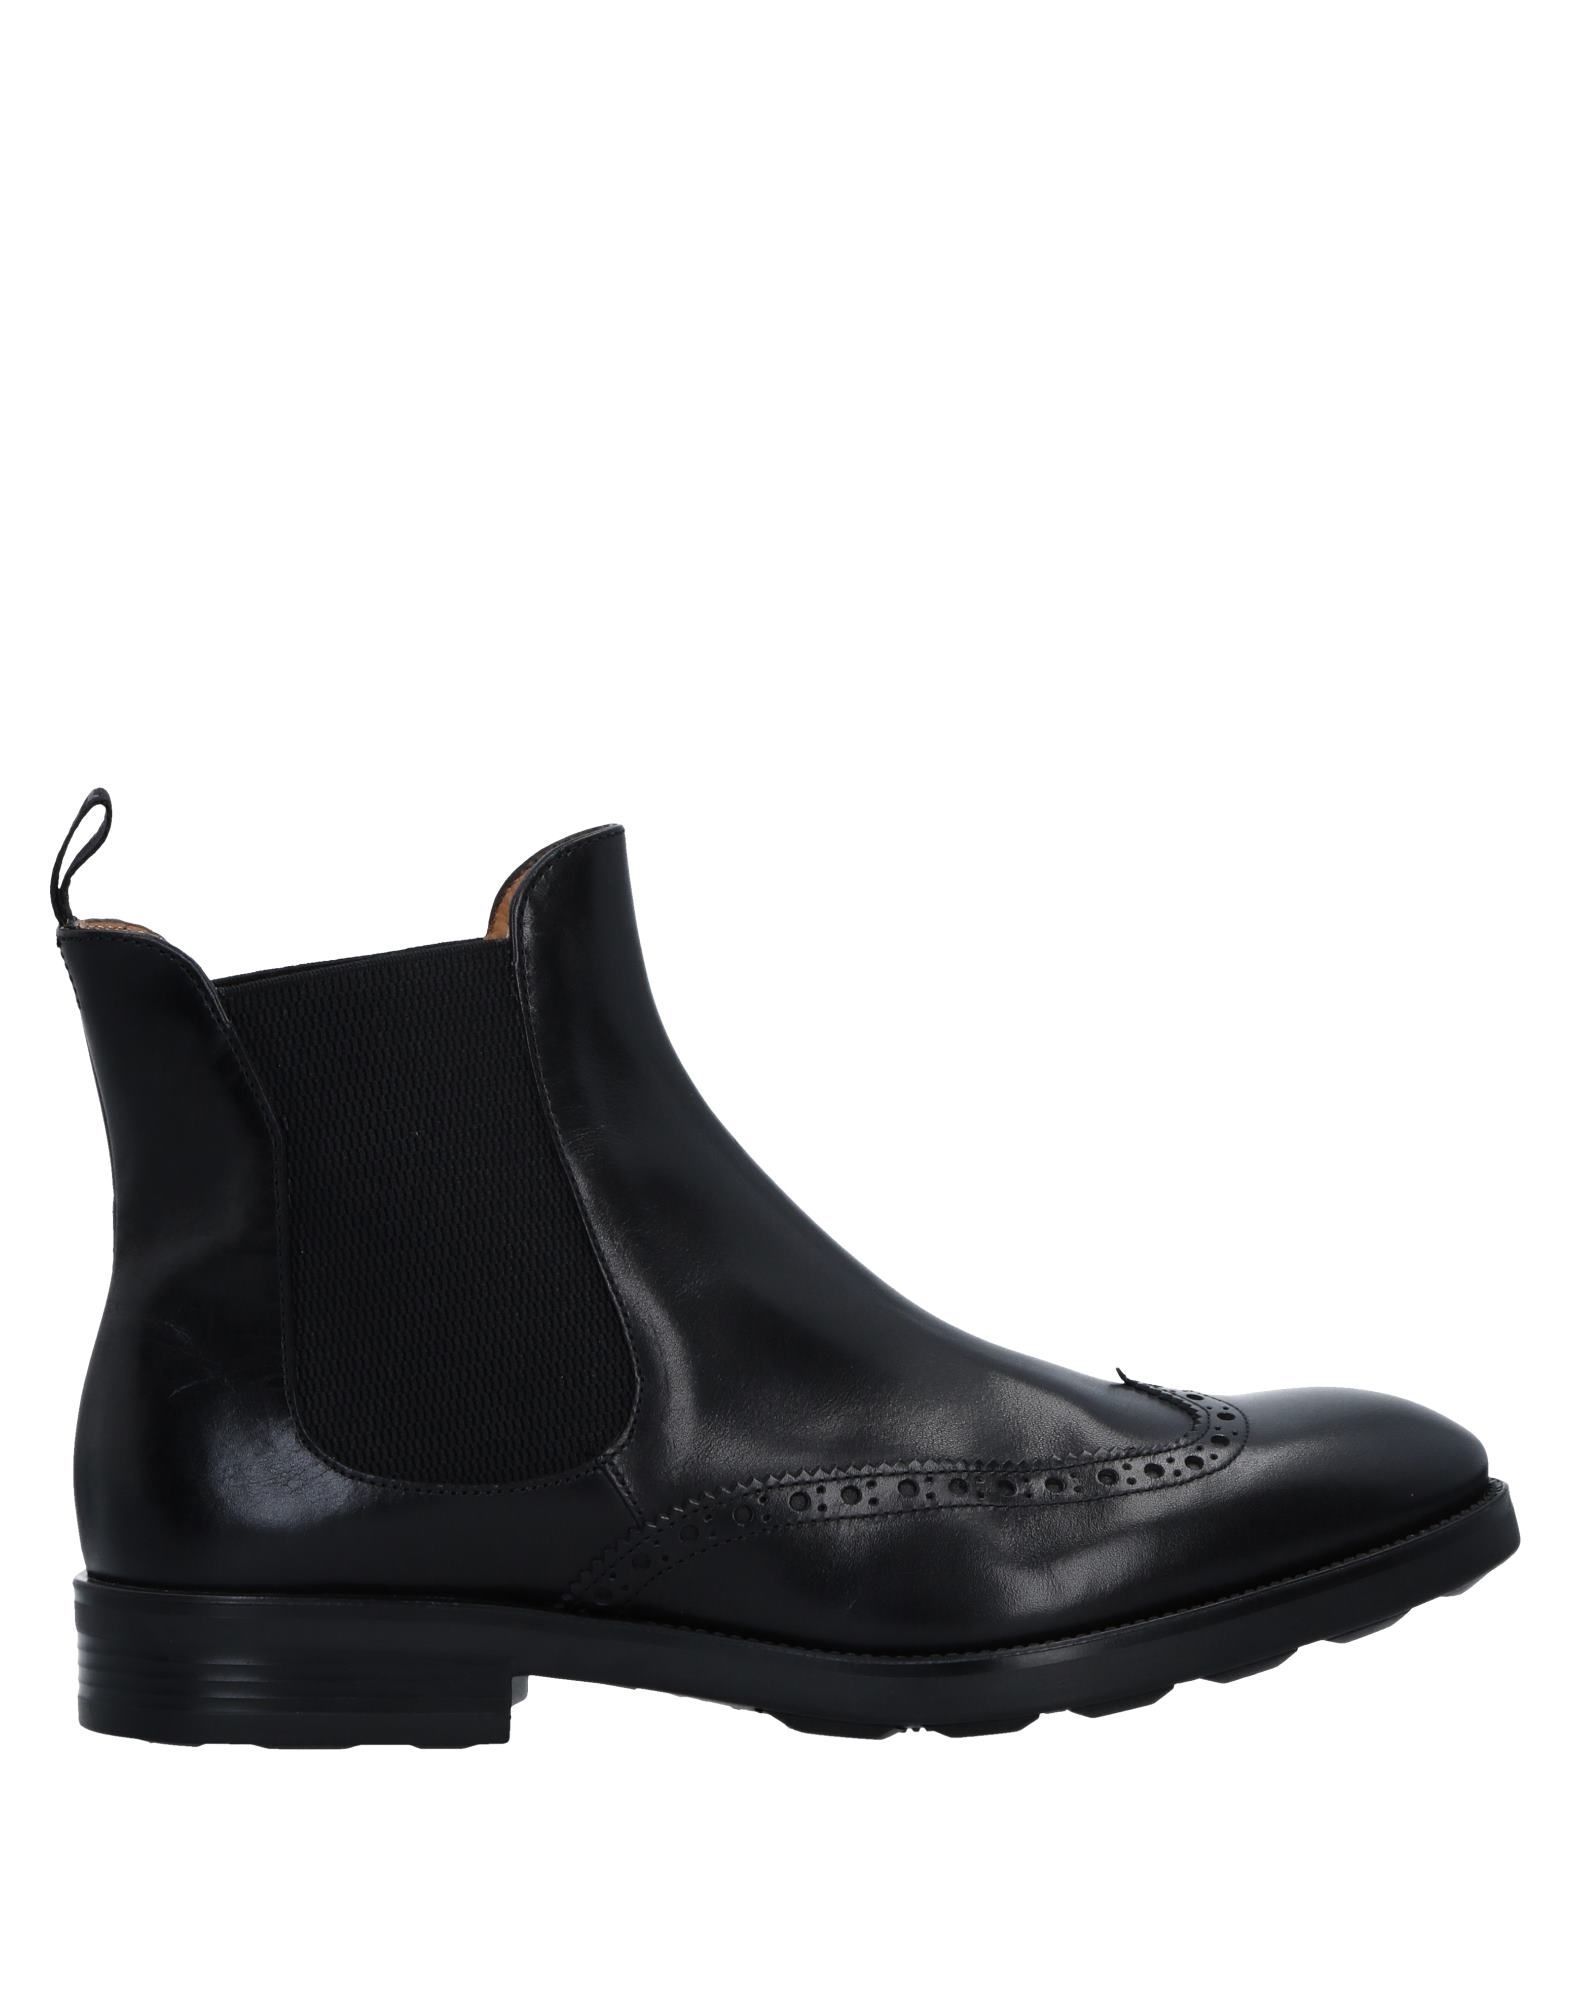 Fabi Boots - Men Fabi Boots online on  United United United Kingdom - 11532523QK 229a70